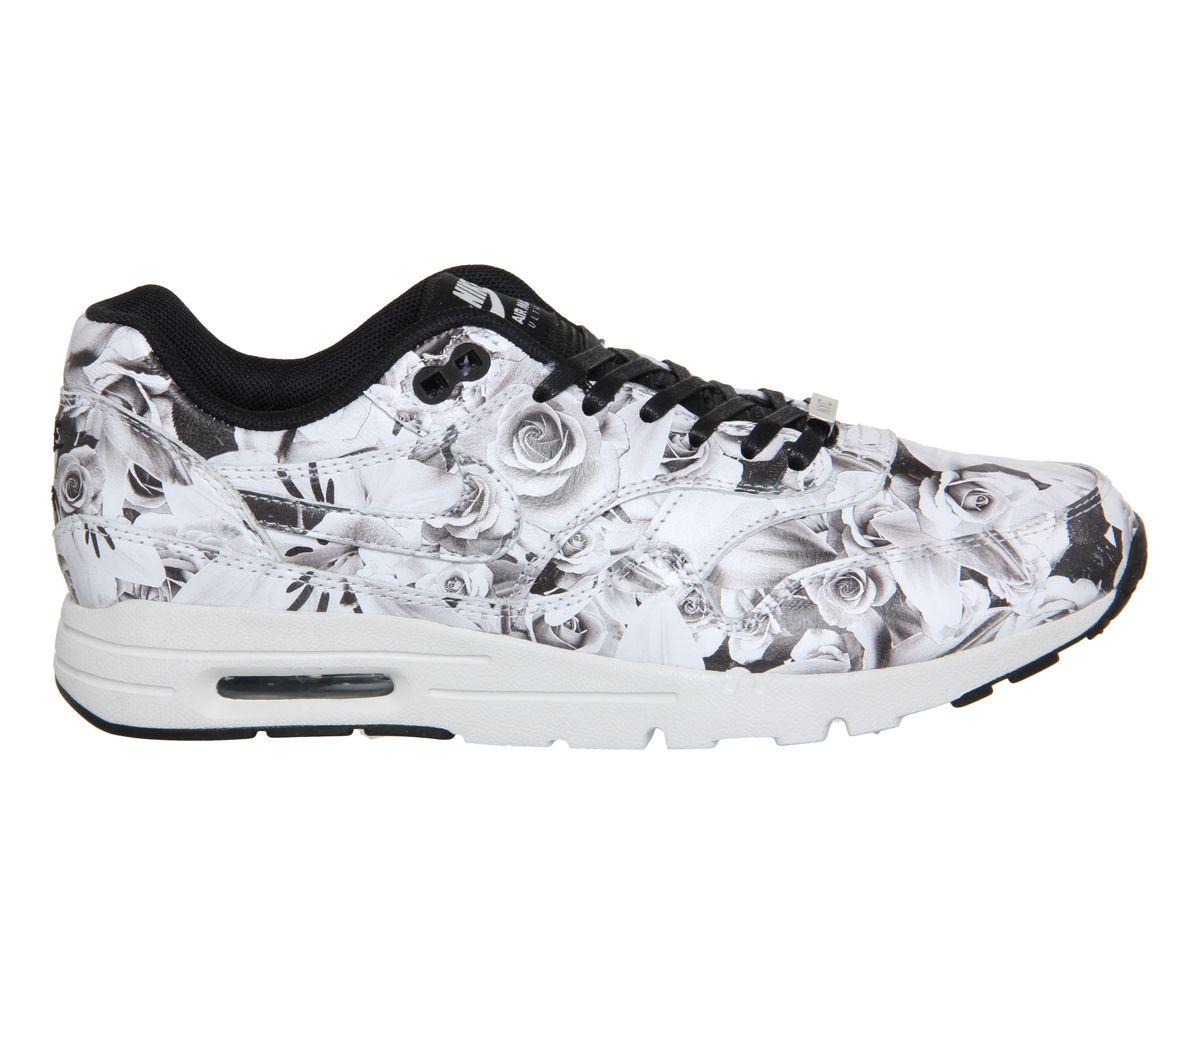 Qs Black MoirelLotc Nike 1 Nyc Max Floral Ultra Hers White Air nPNwX0k8O